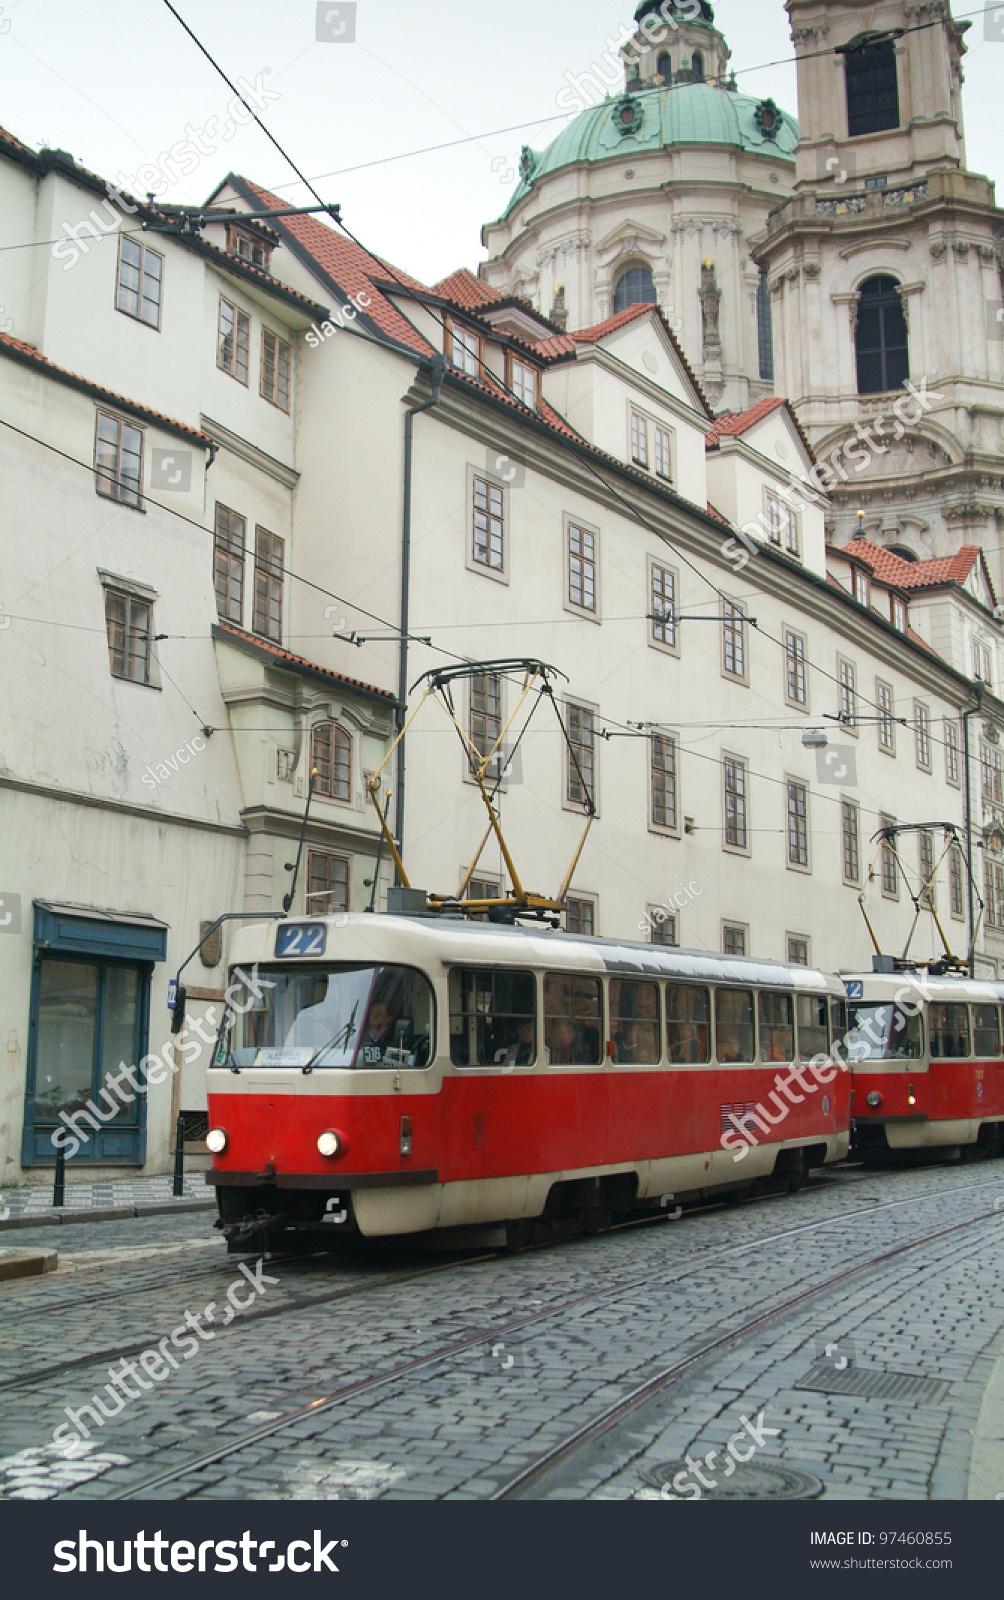 old tram prague street - photo #17